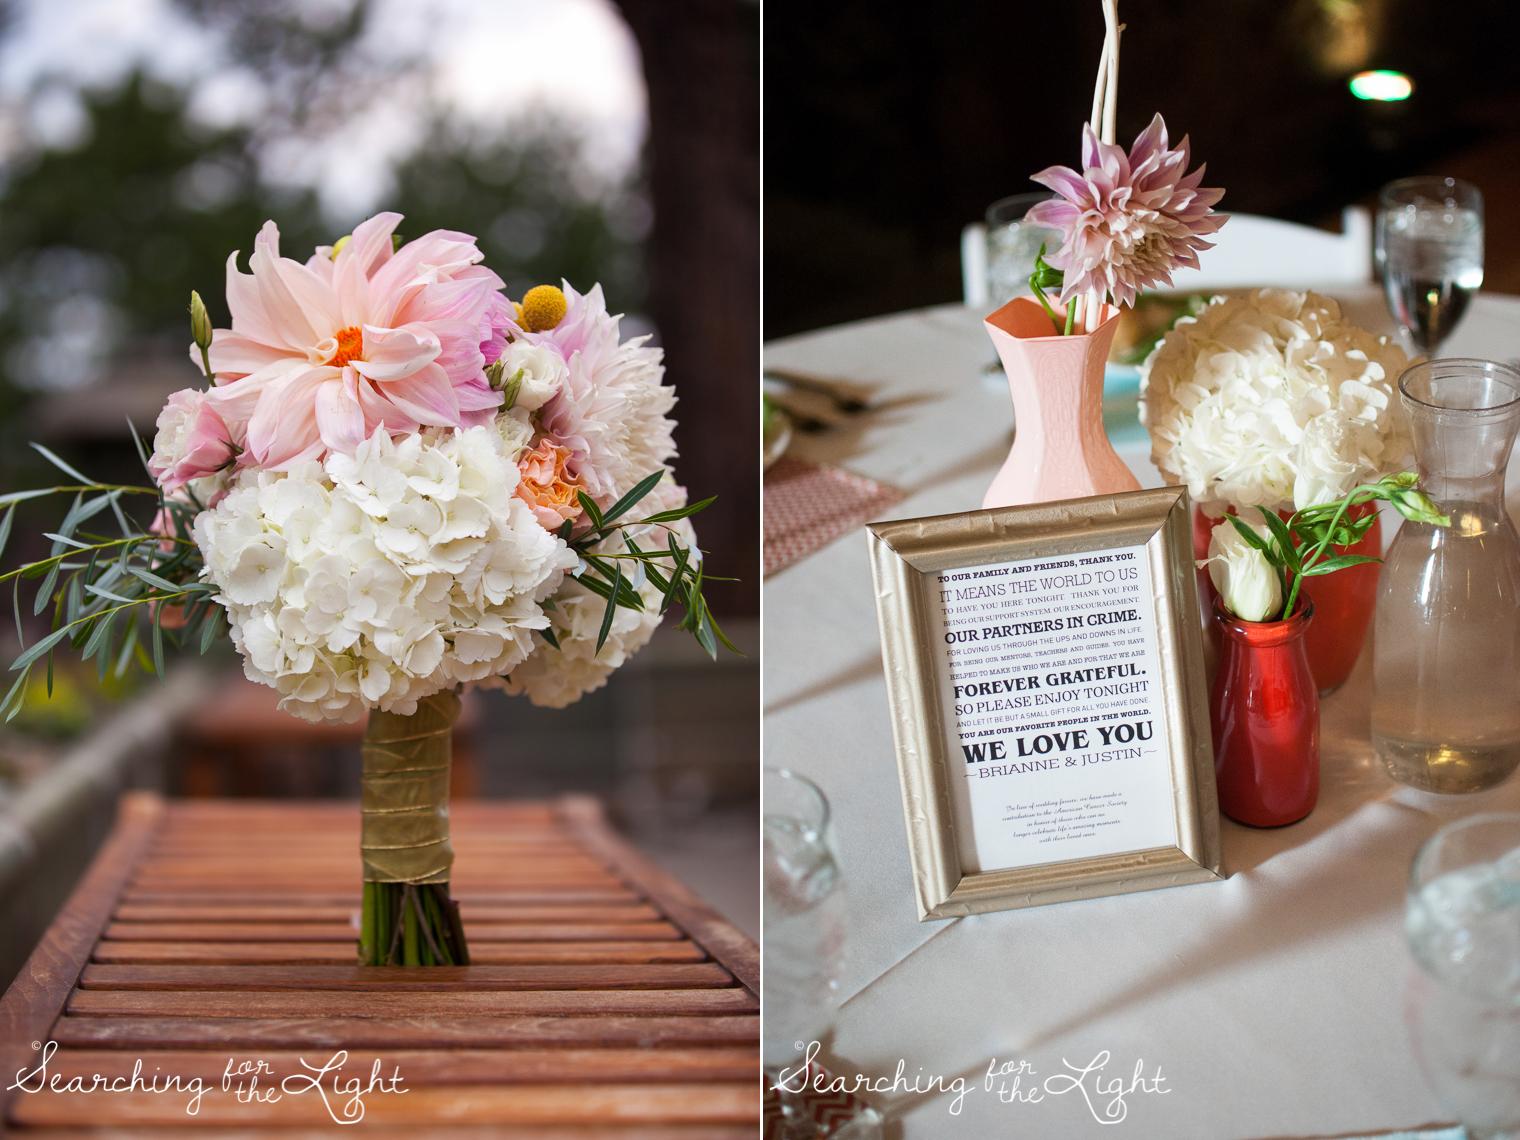 wedding  Boettcher Mansion wedding photos from a Denver wedding photographer featuring Ladybird Poppy Floral designs